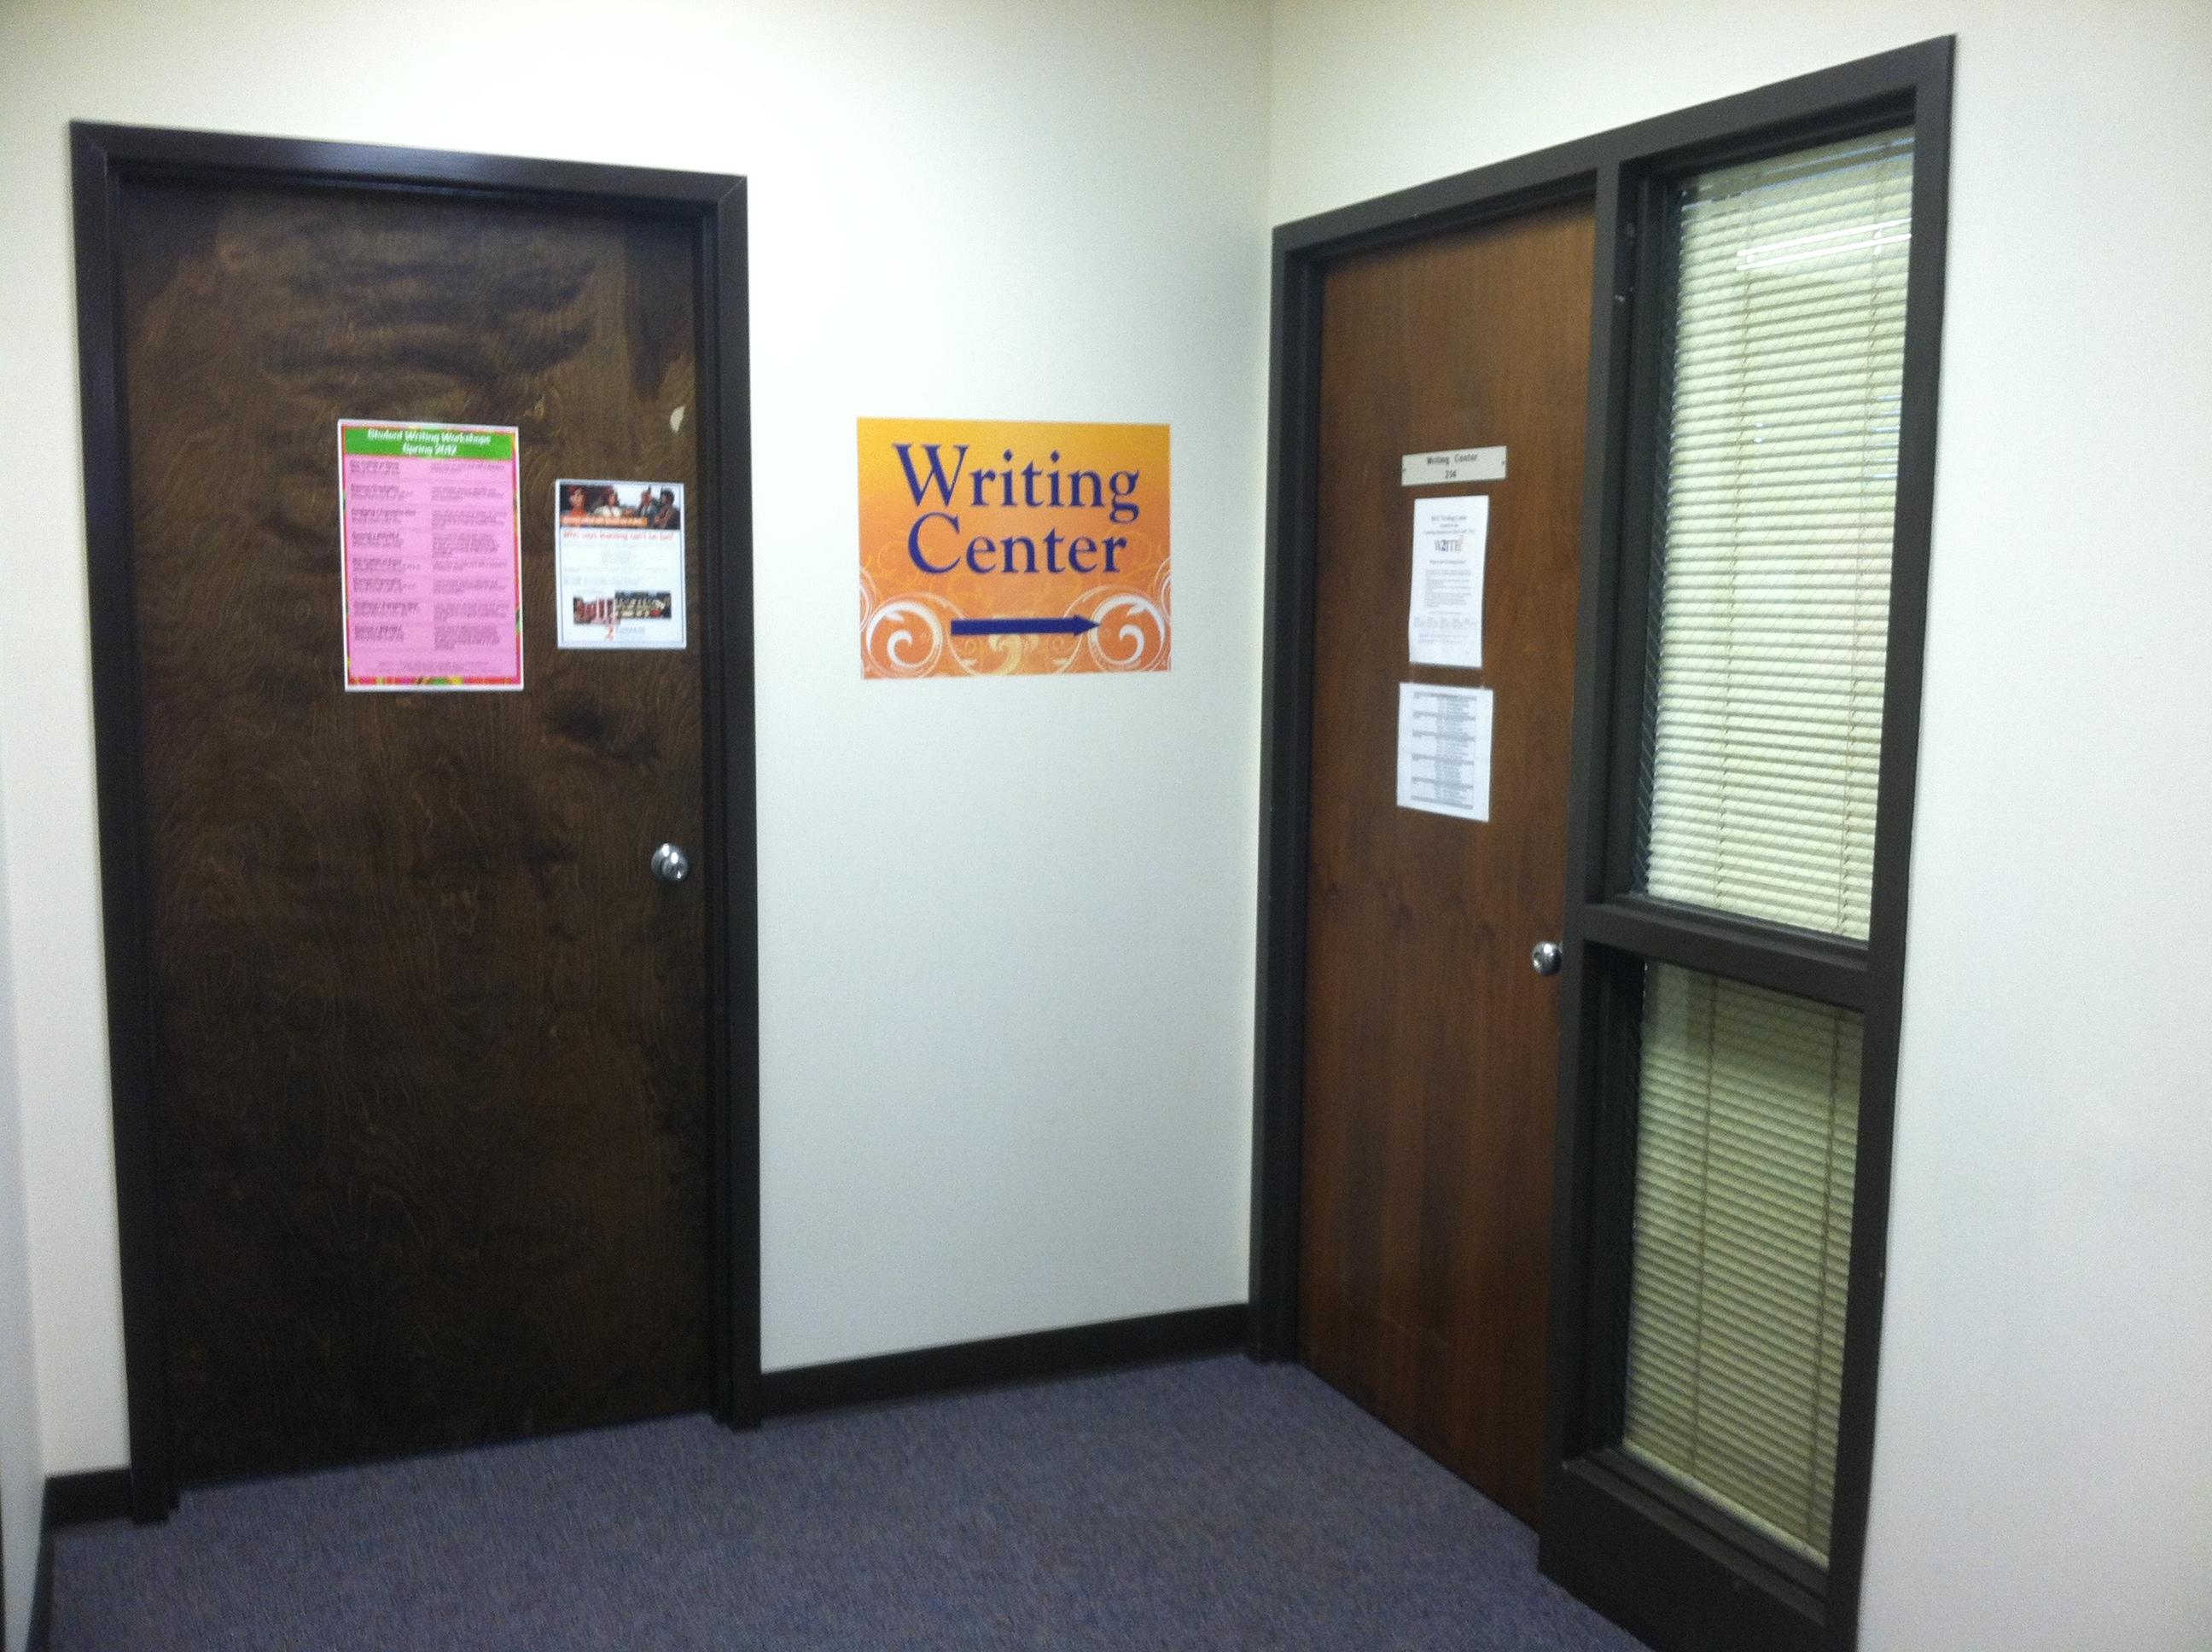 Writing Center entrance